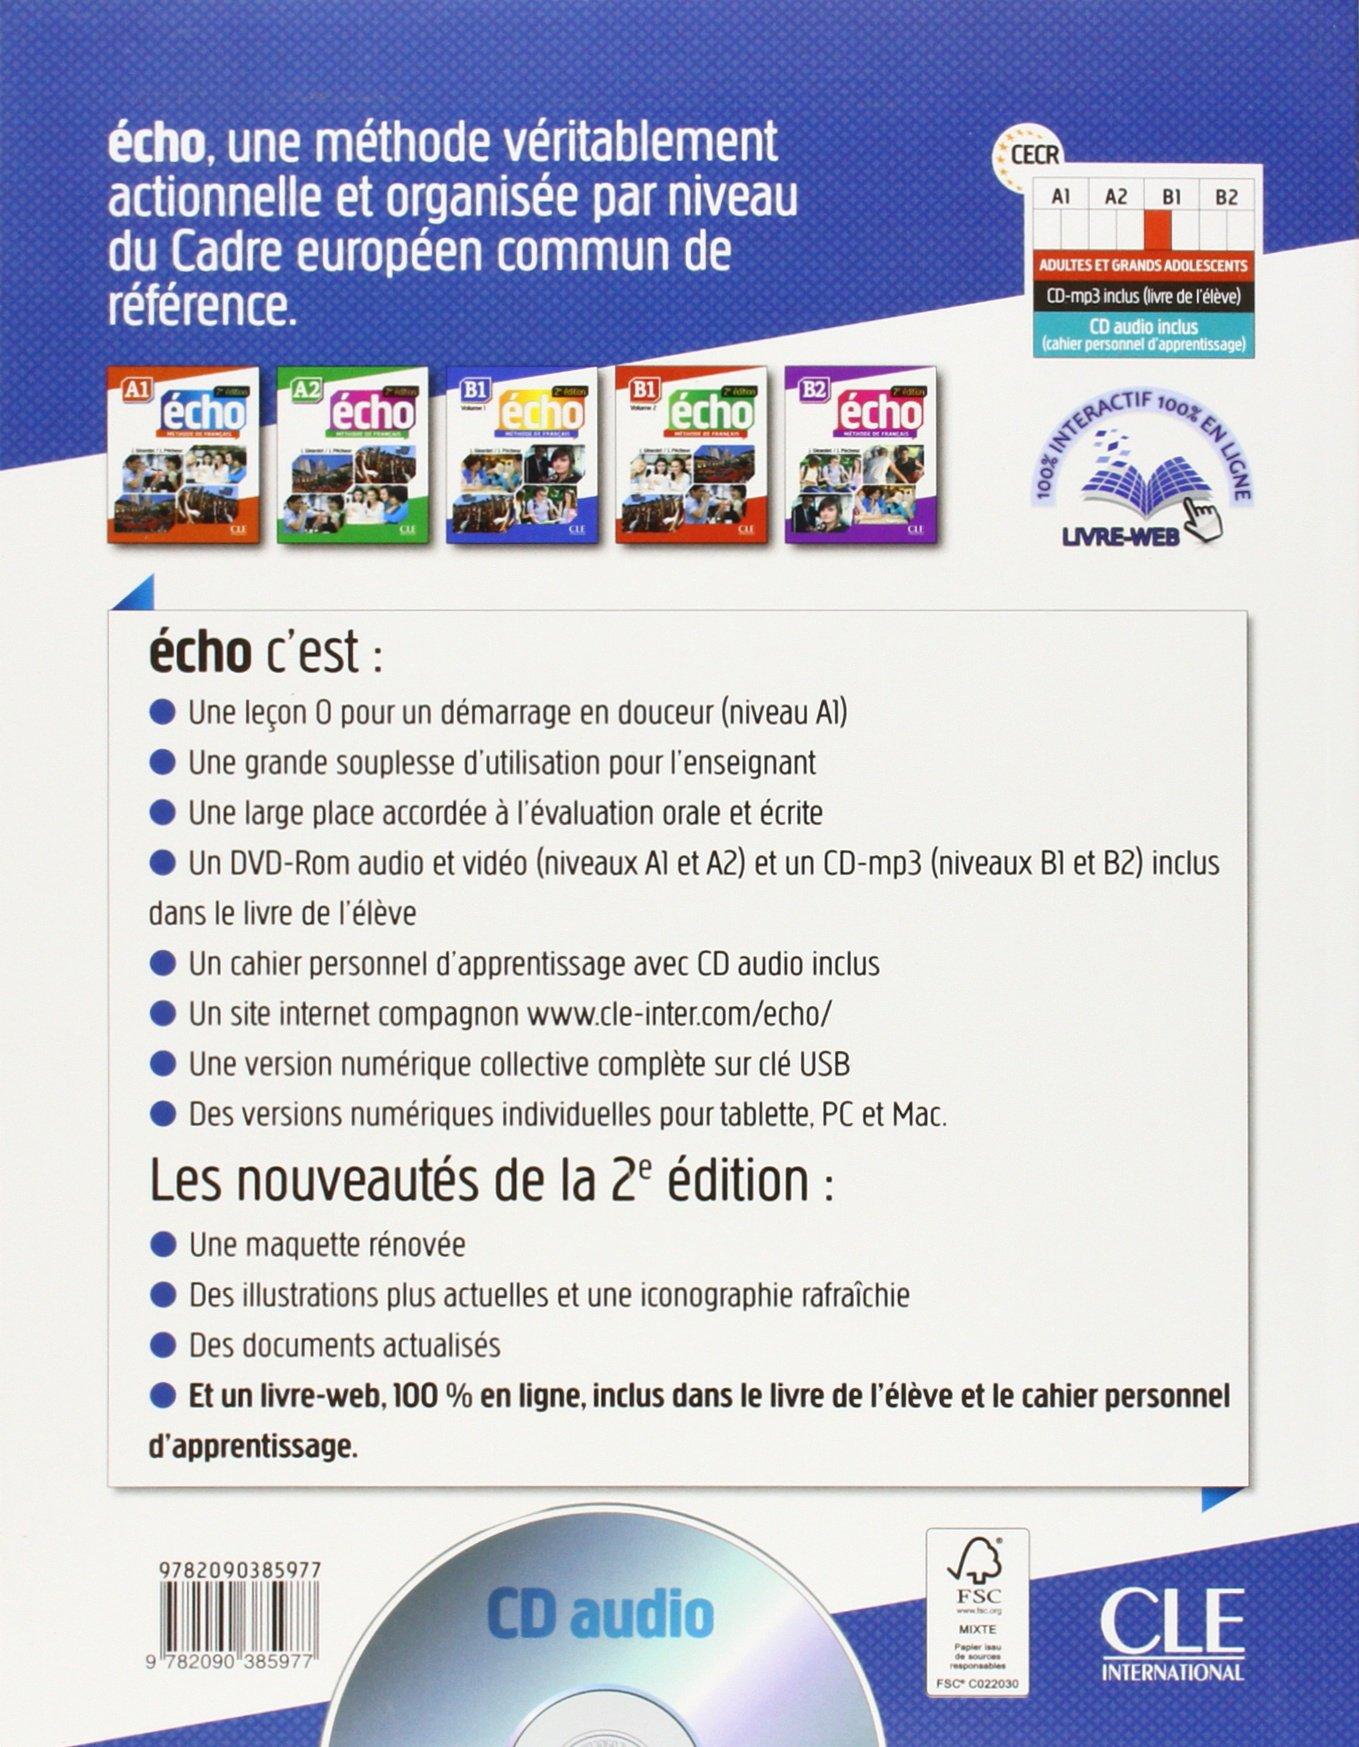 Methode Echo 2eme Edition Niveau B1 1 Cahier d Apprentissage CD